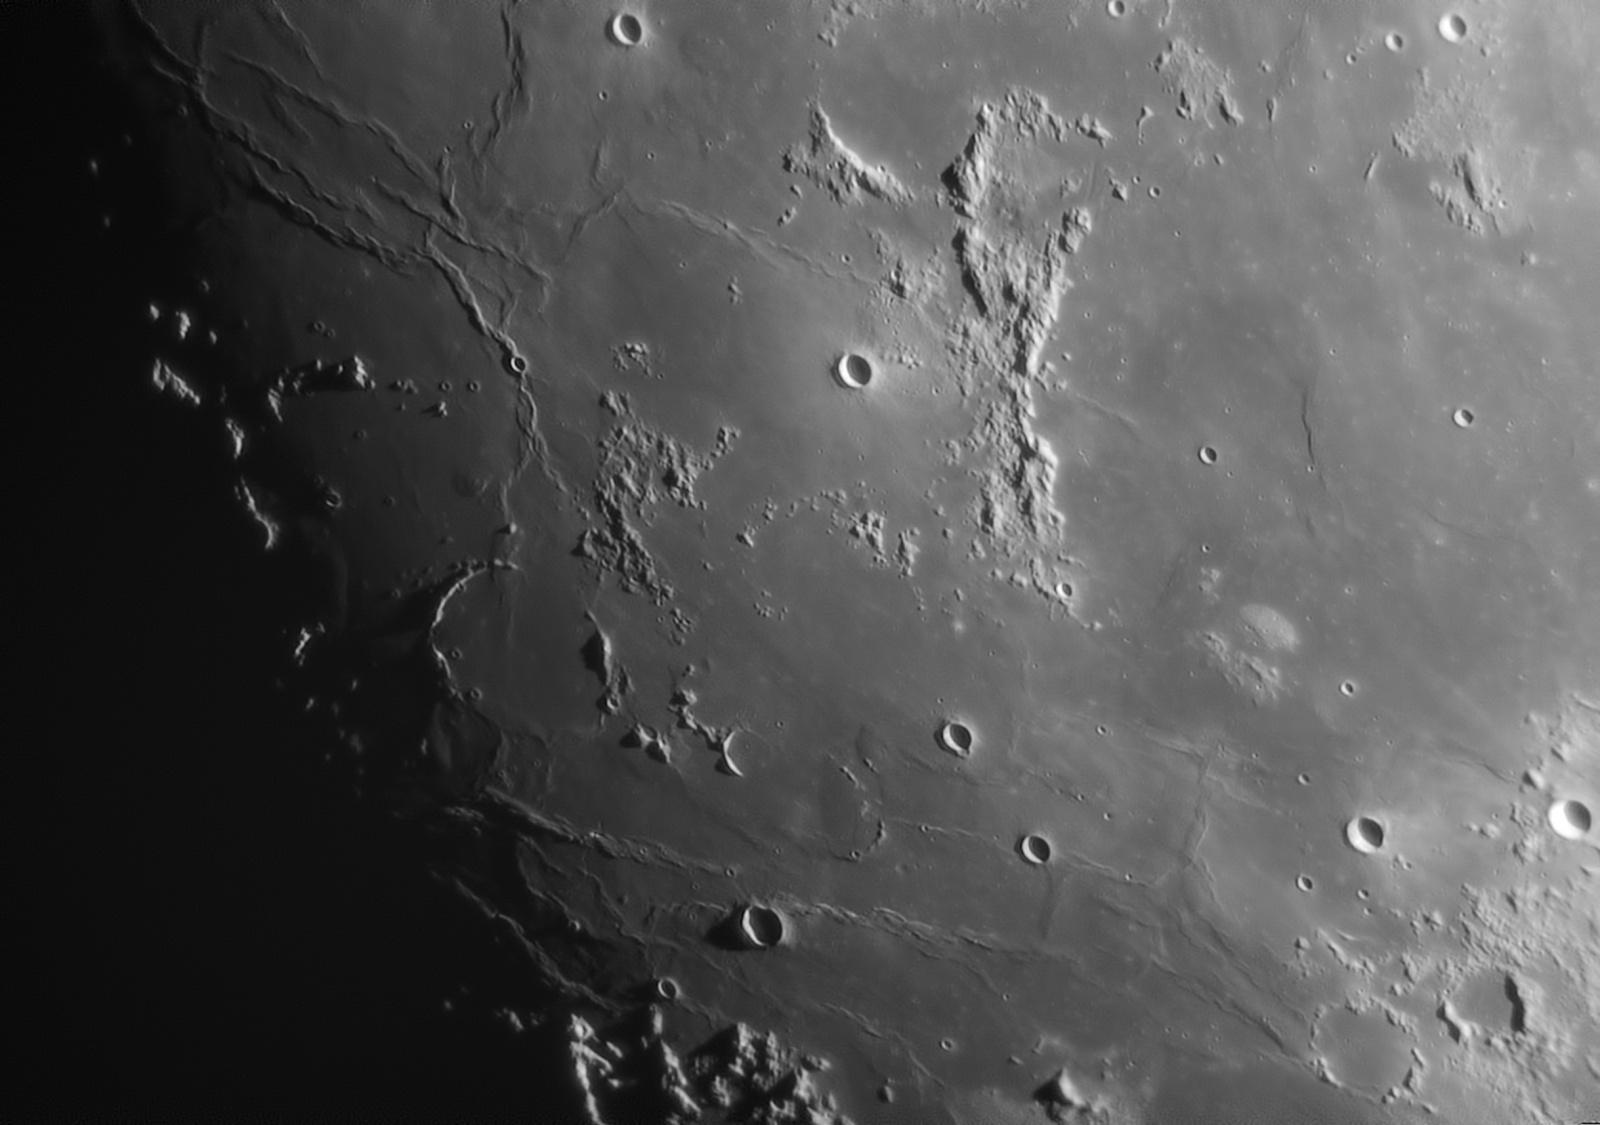 moon1.thumb.jpg.dd267d8cc096e58d28e8d1f3751b8ef0.jpg